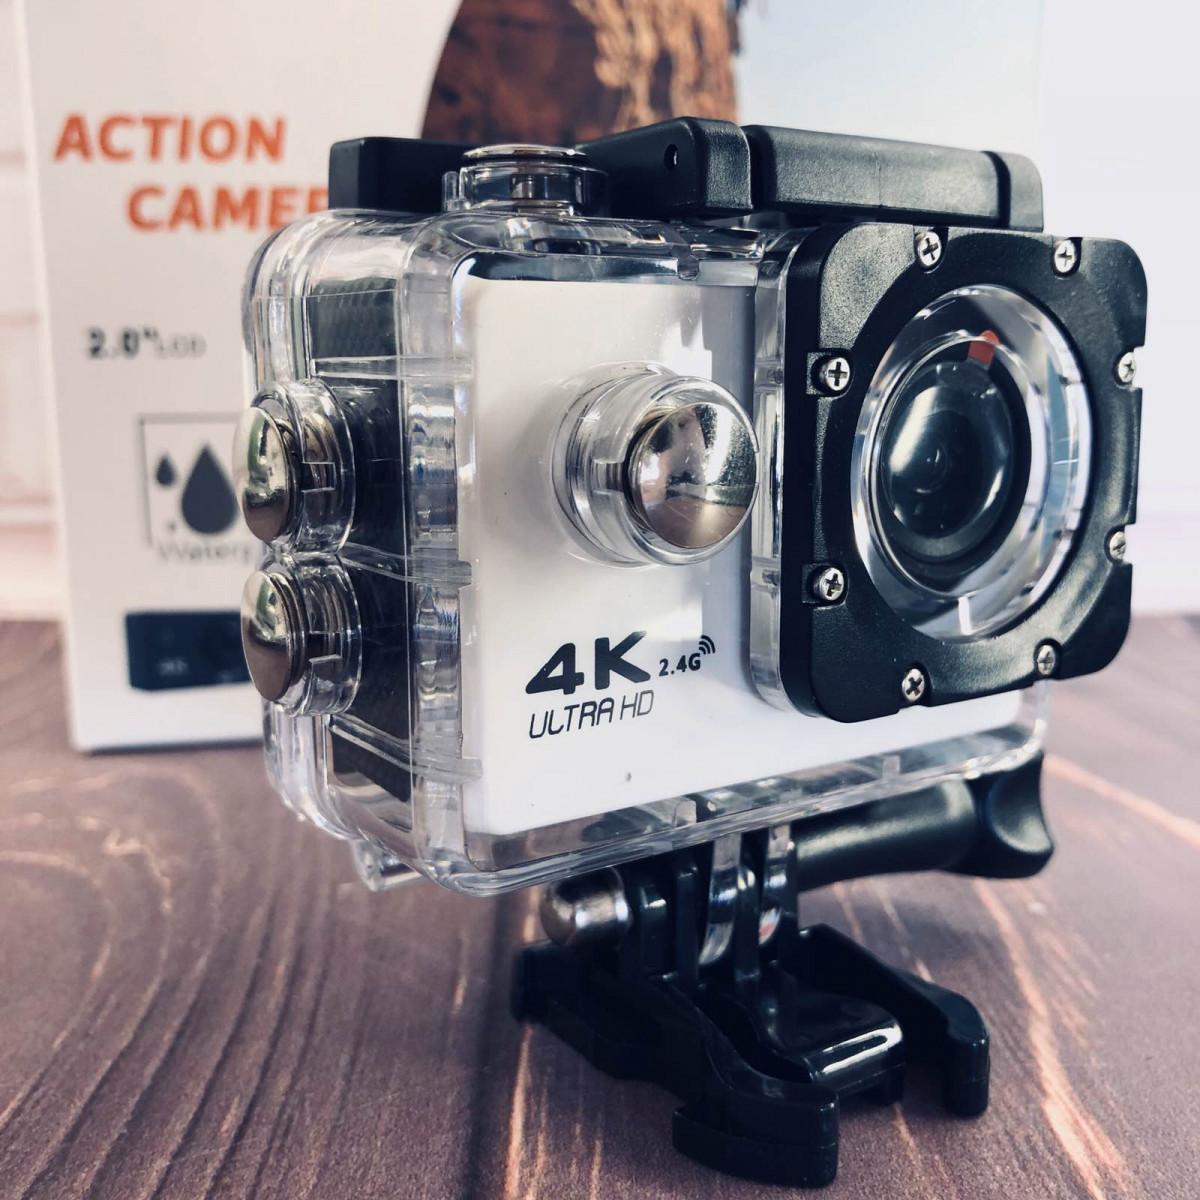 Водонепроницаемая спортивная экшн камера F60 белая